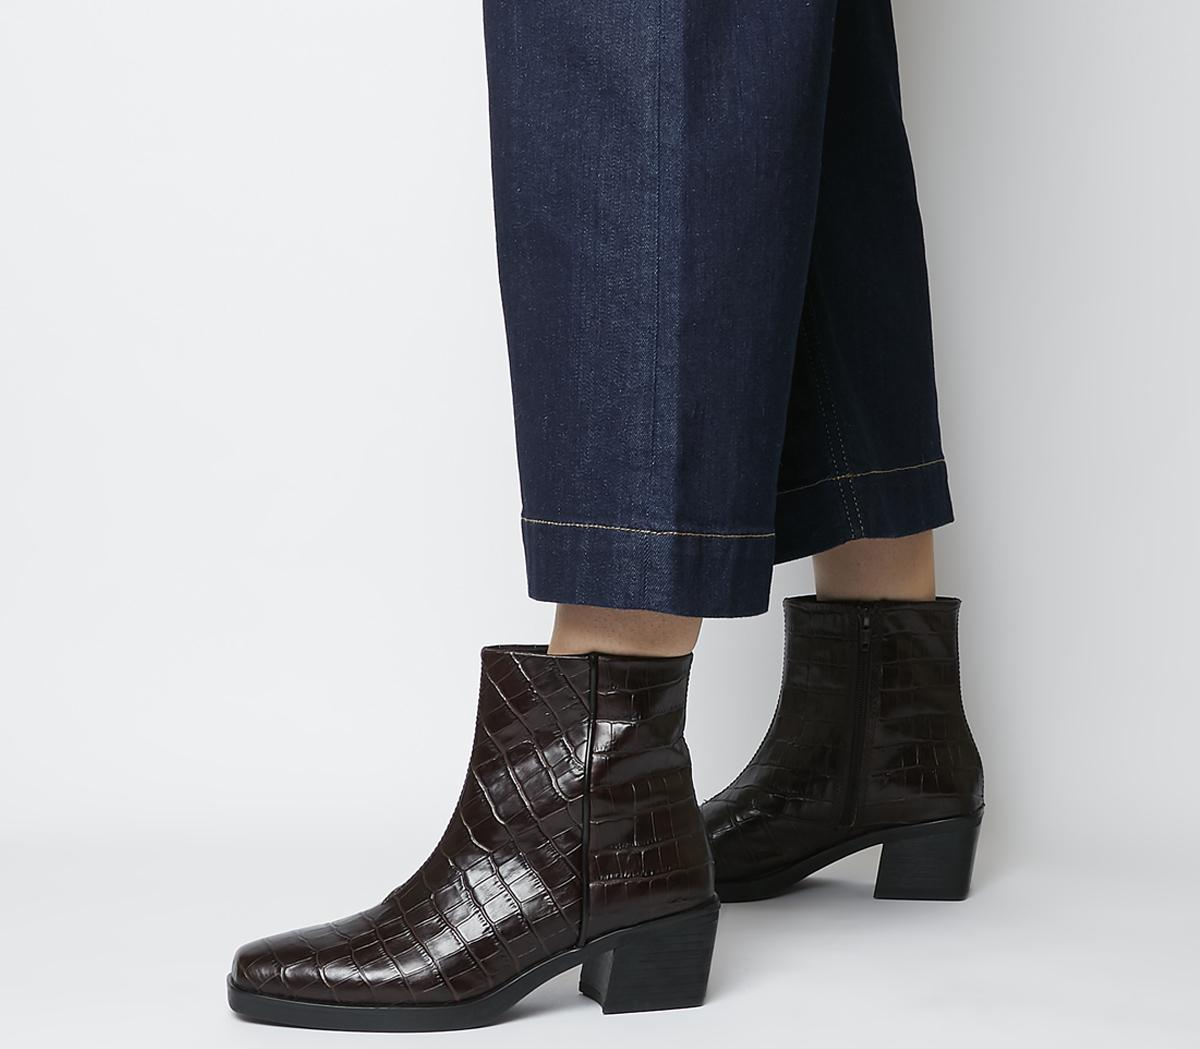 Vagabond Simone Ankle Boots Brown